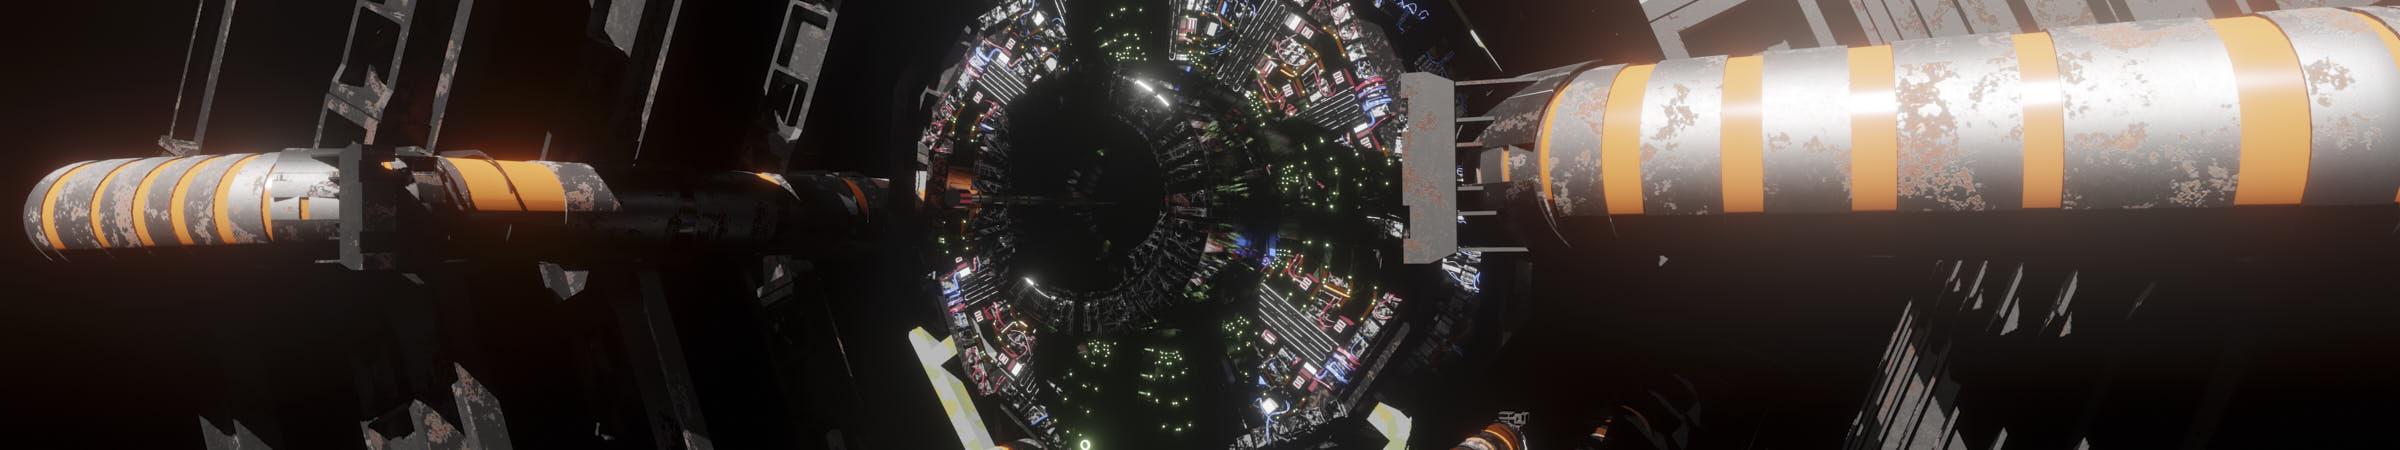 Jaehun Park Solo Exhibition: Real-time Limbo